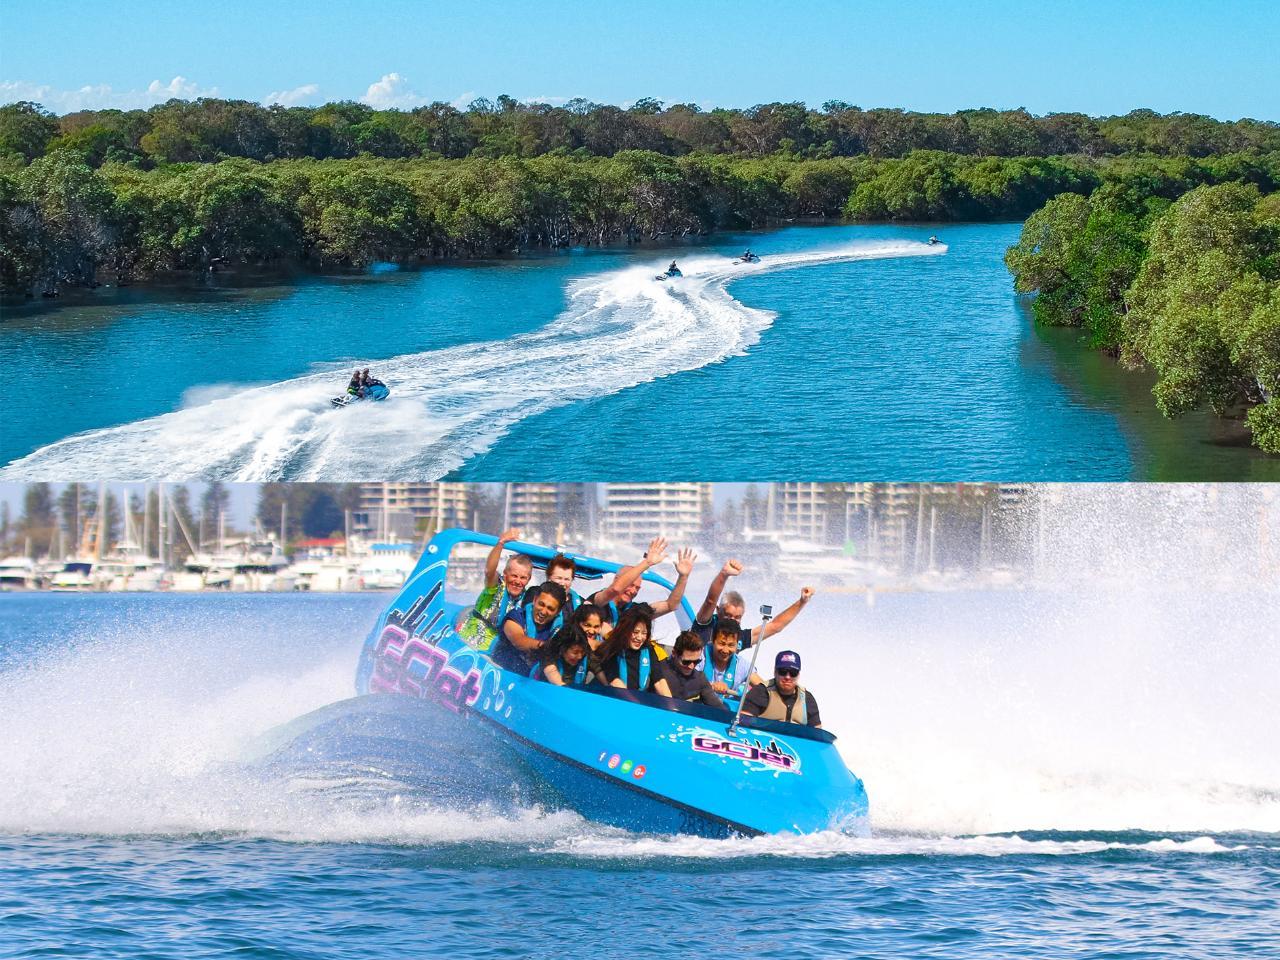 Jet boat & Jet Ski 1 hour - 2 Adults